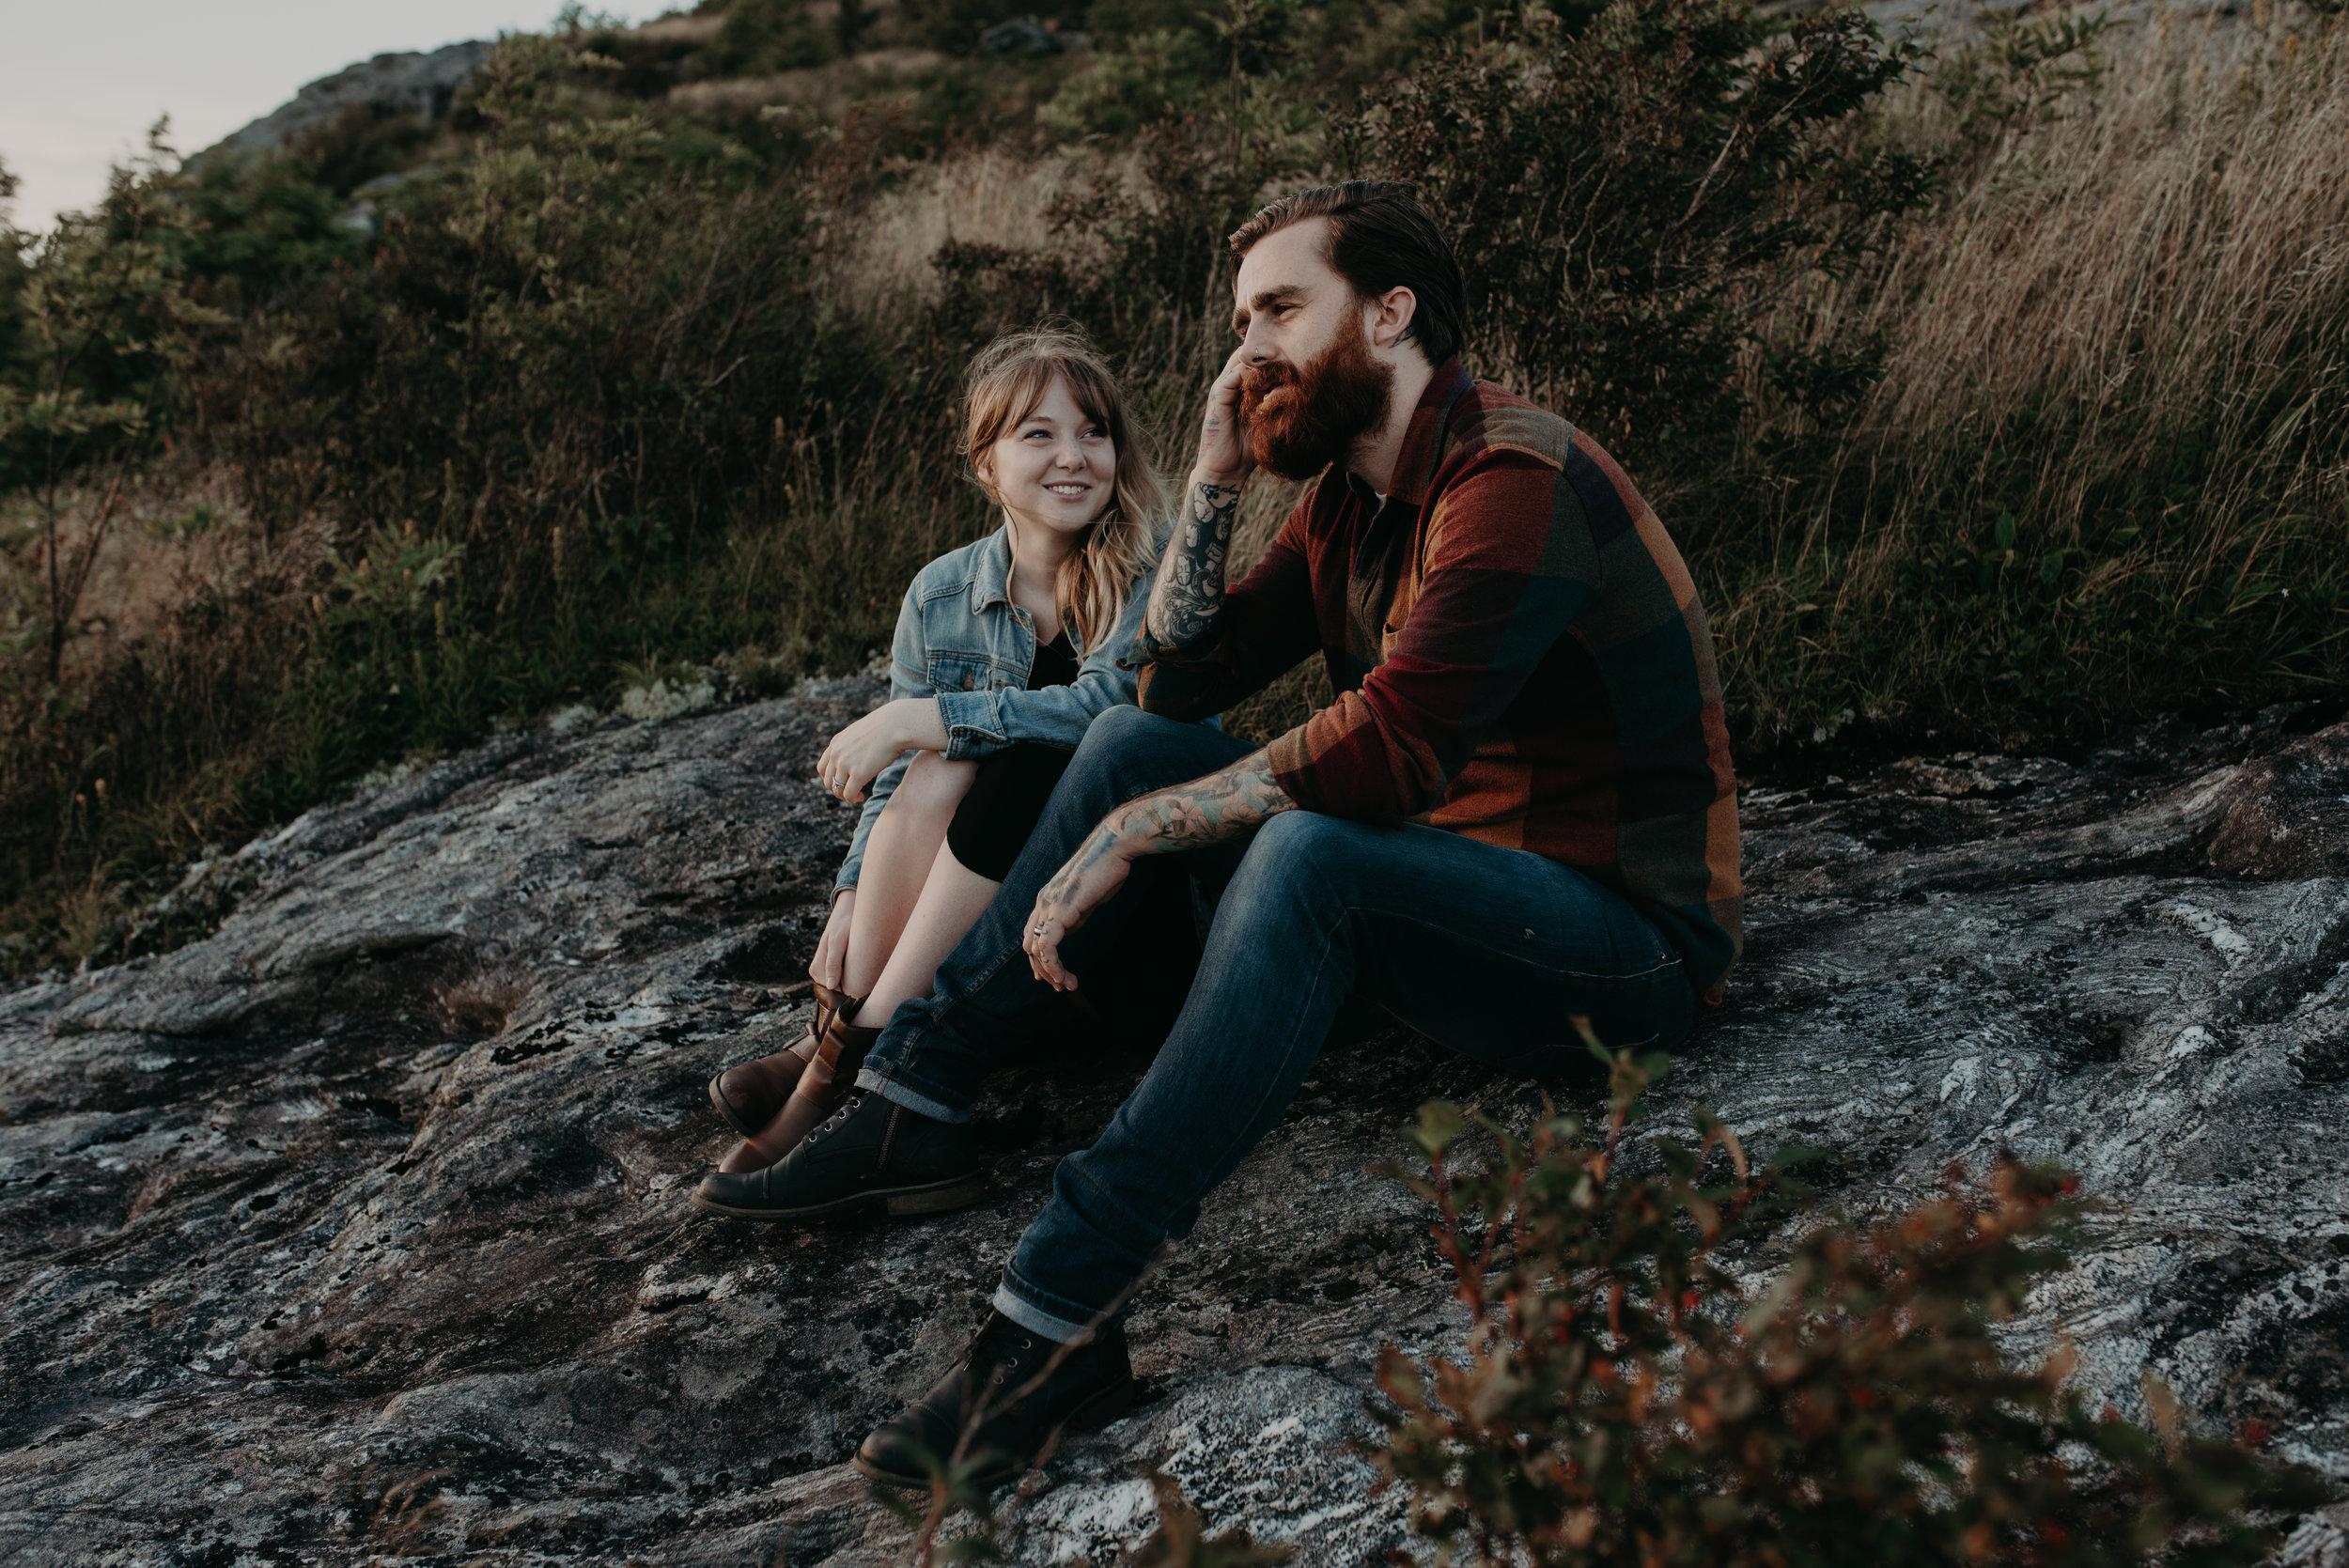 leah-joe-middleton-asheville-north-carolina-couple-session-destination-elopement-photographer-fox-and-film-145.jpg